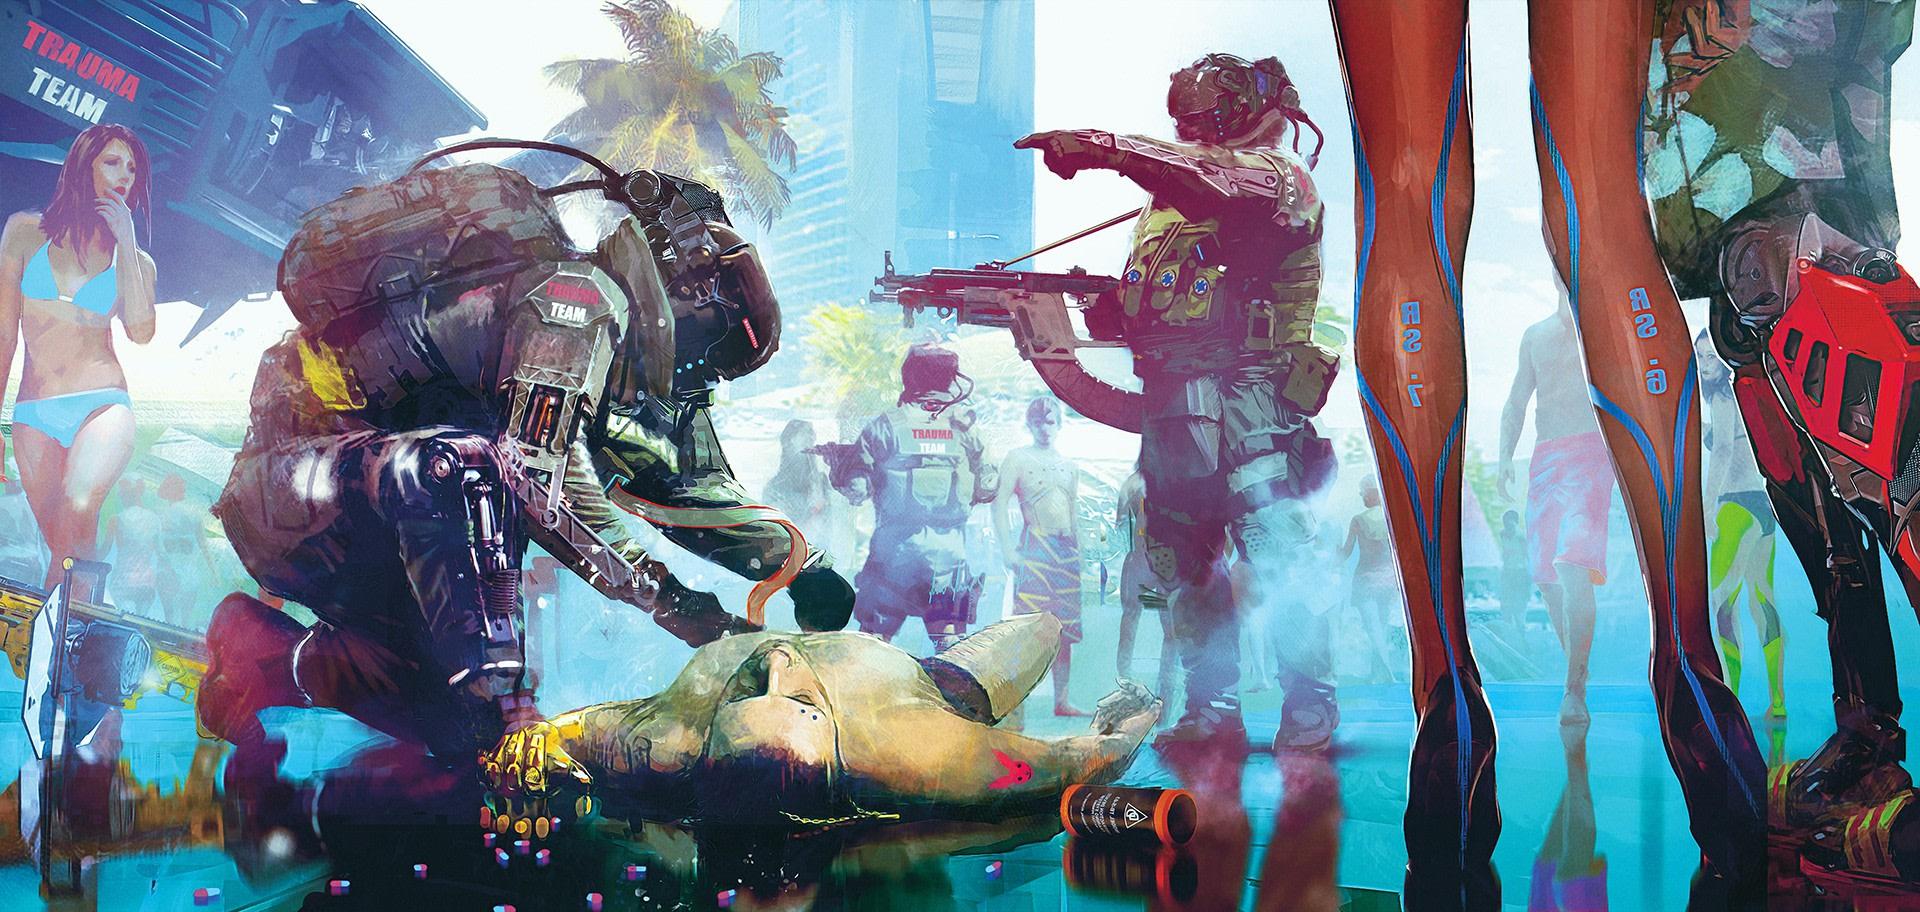 The Dystopian Future of Cyberpunk